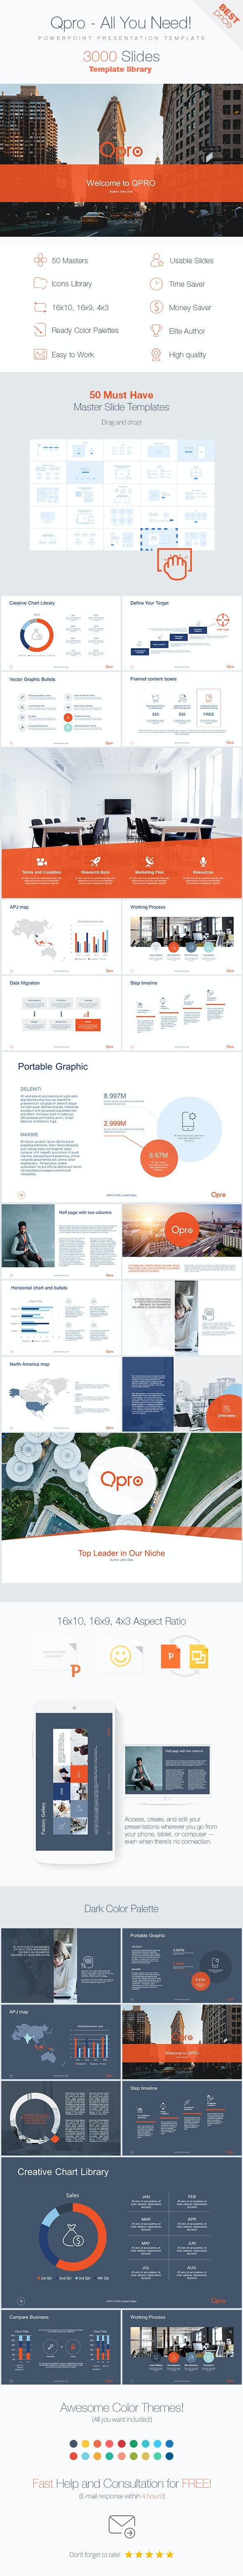 Qpro 3000 - Powerpoint Presentation Template - Business PowerPoint Templates